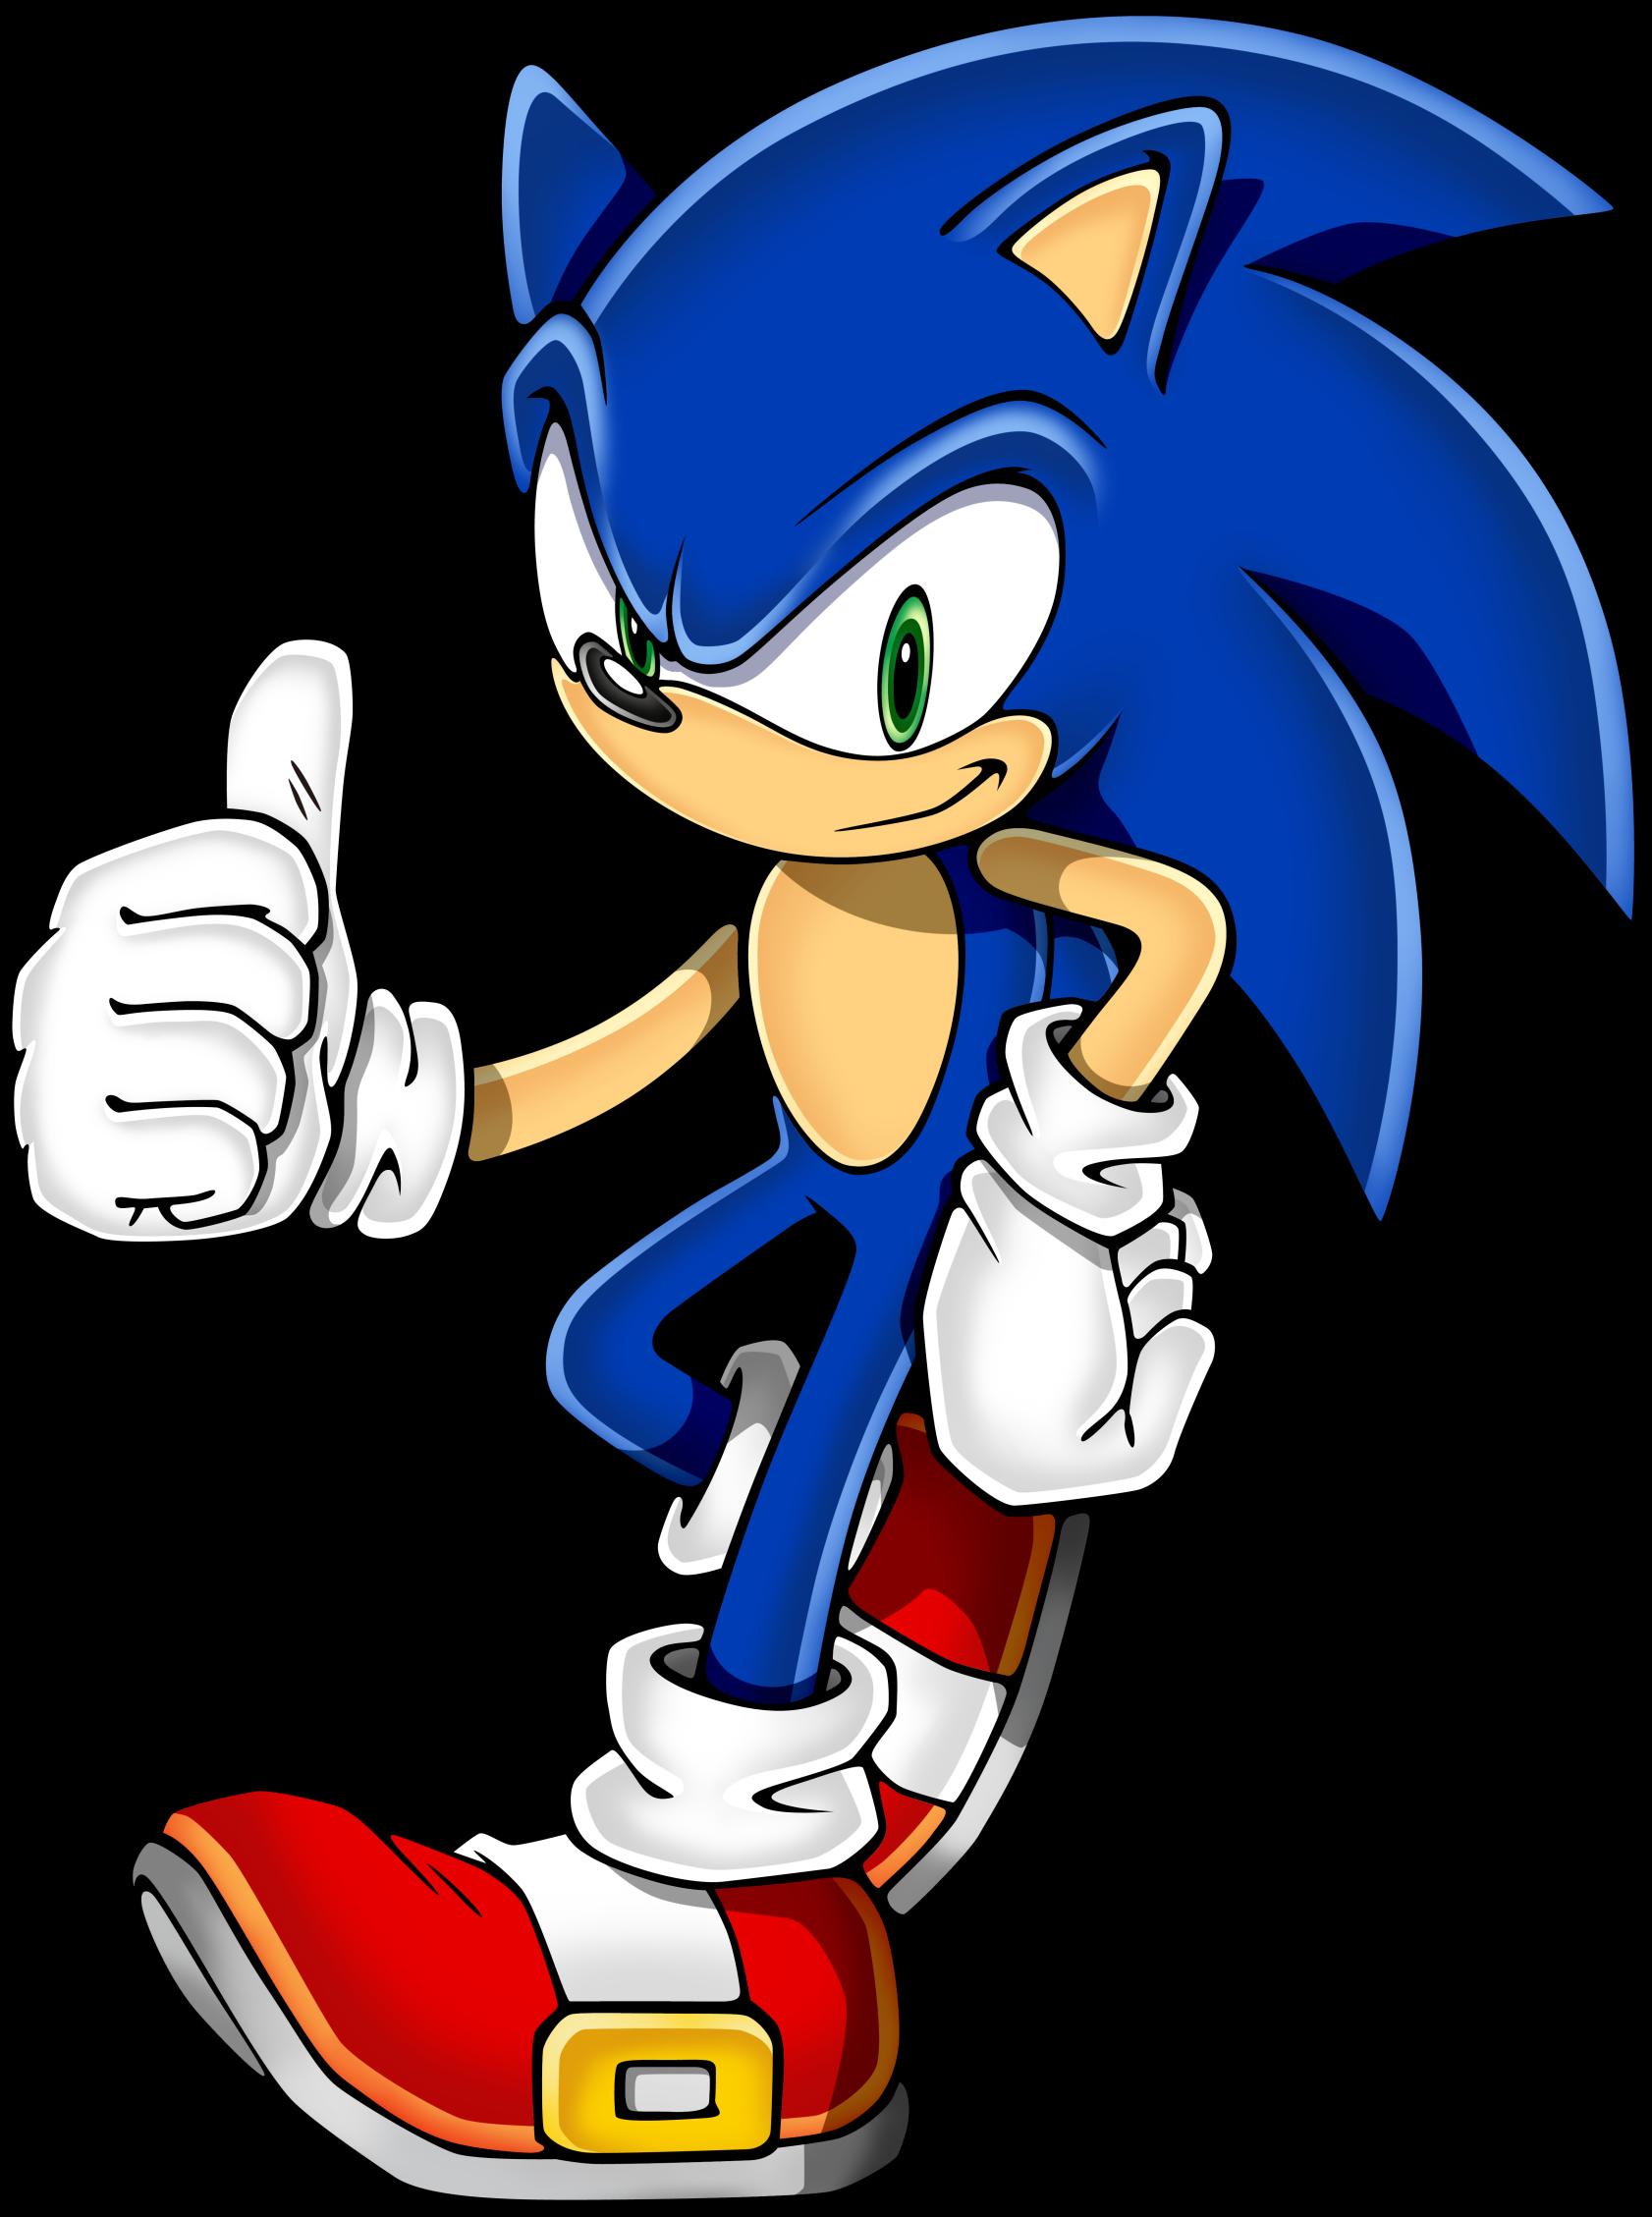 Hammock clipart dormant. Sonic the hedgehog united